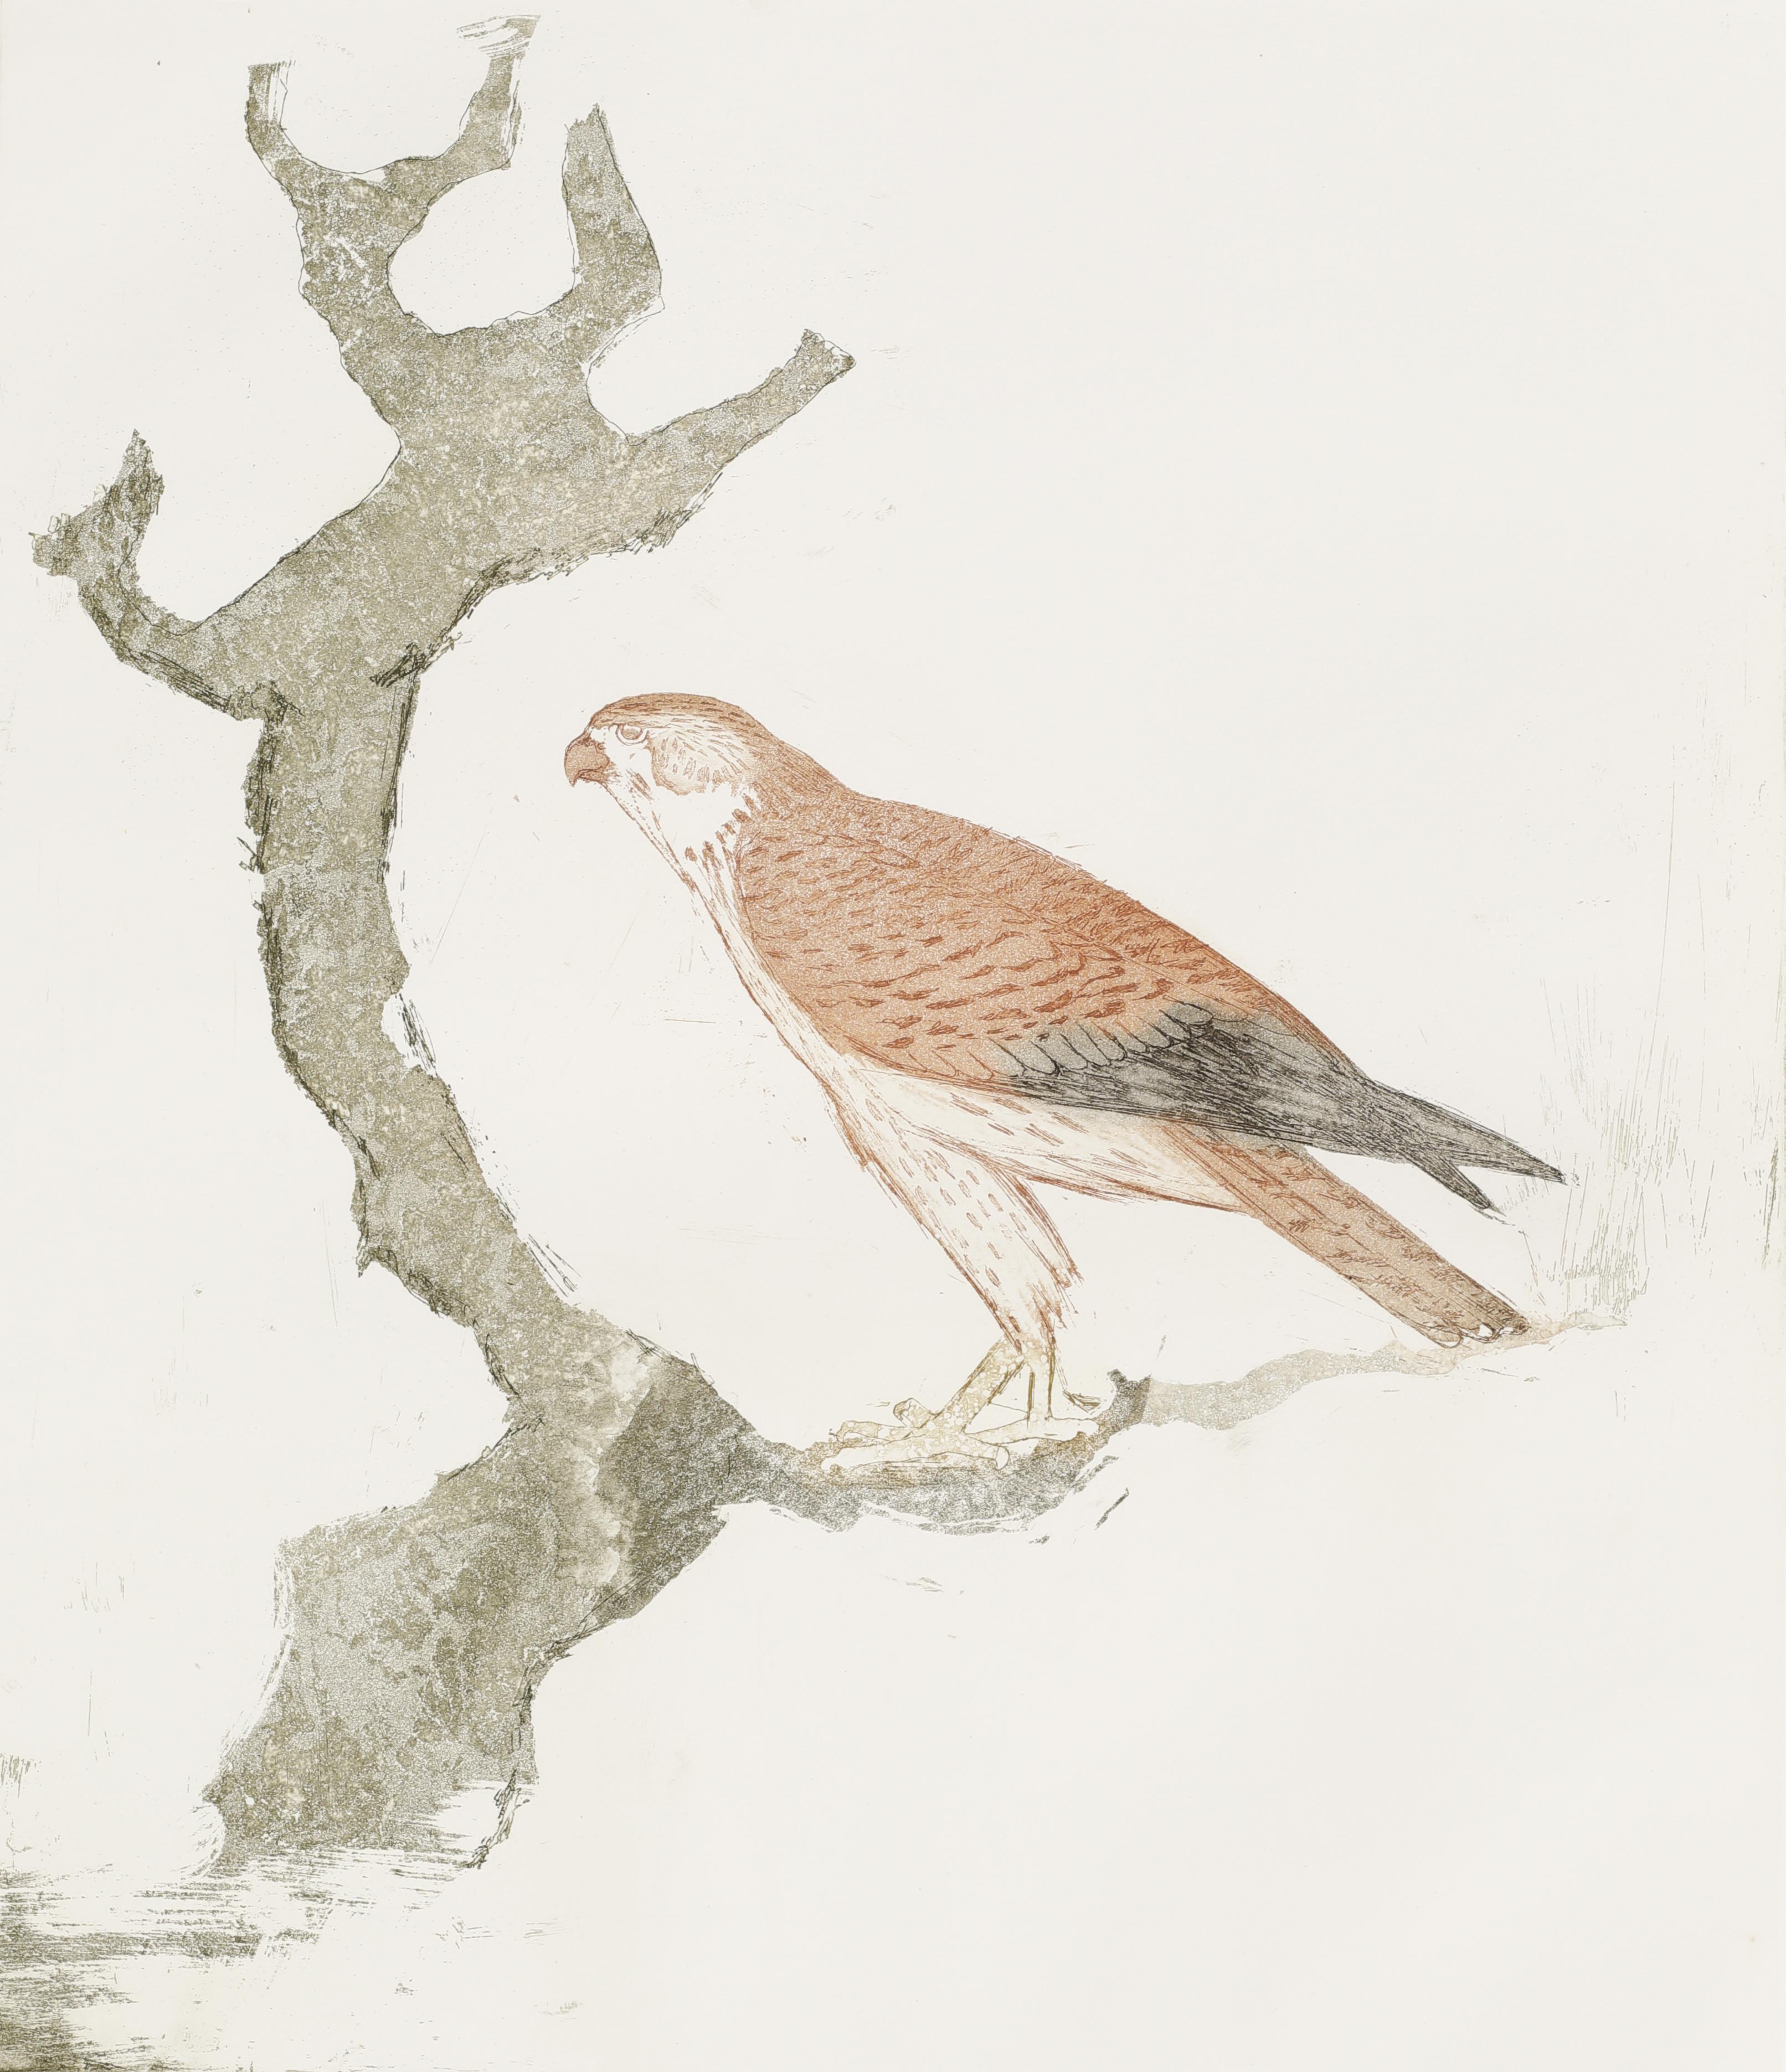 Elisabeth Frink. Kestrel, from Birds of Prey, 1974. Etching and aquatint on paper, 29/50.